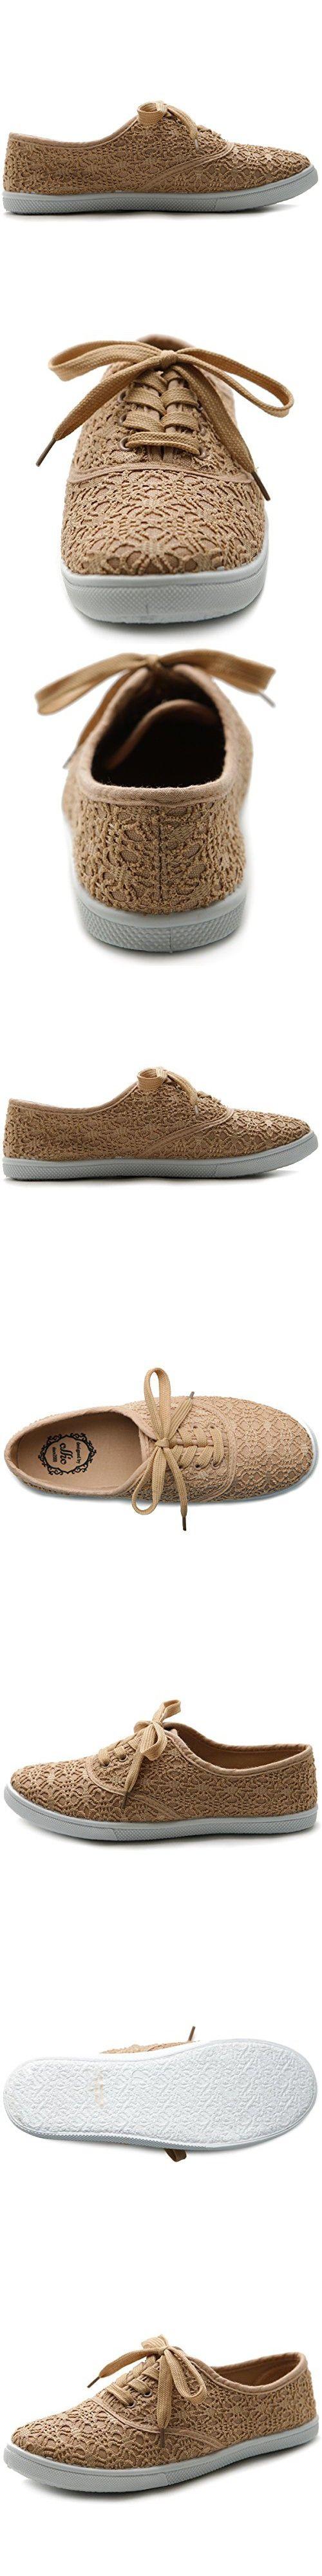 Ollio Women's Ballet Shoe Lace Up Sneaker Canvas Flat (9 B(M) US, Tan)